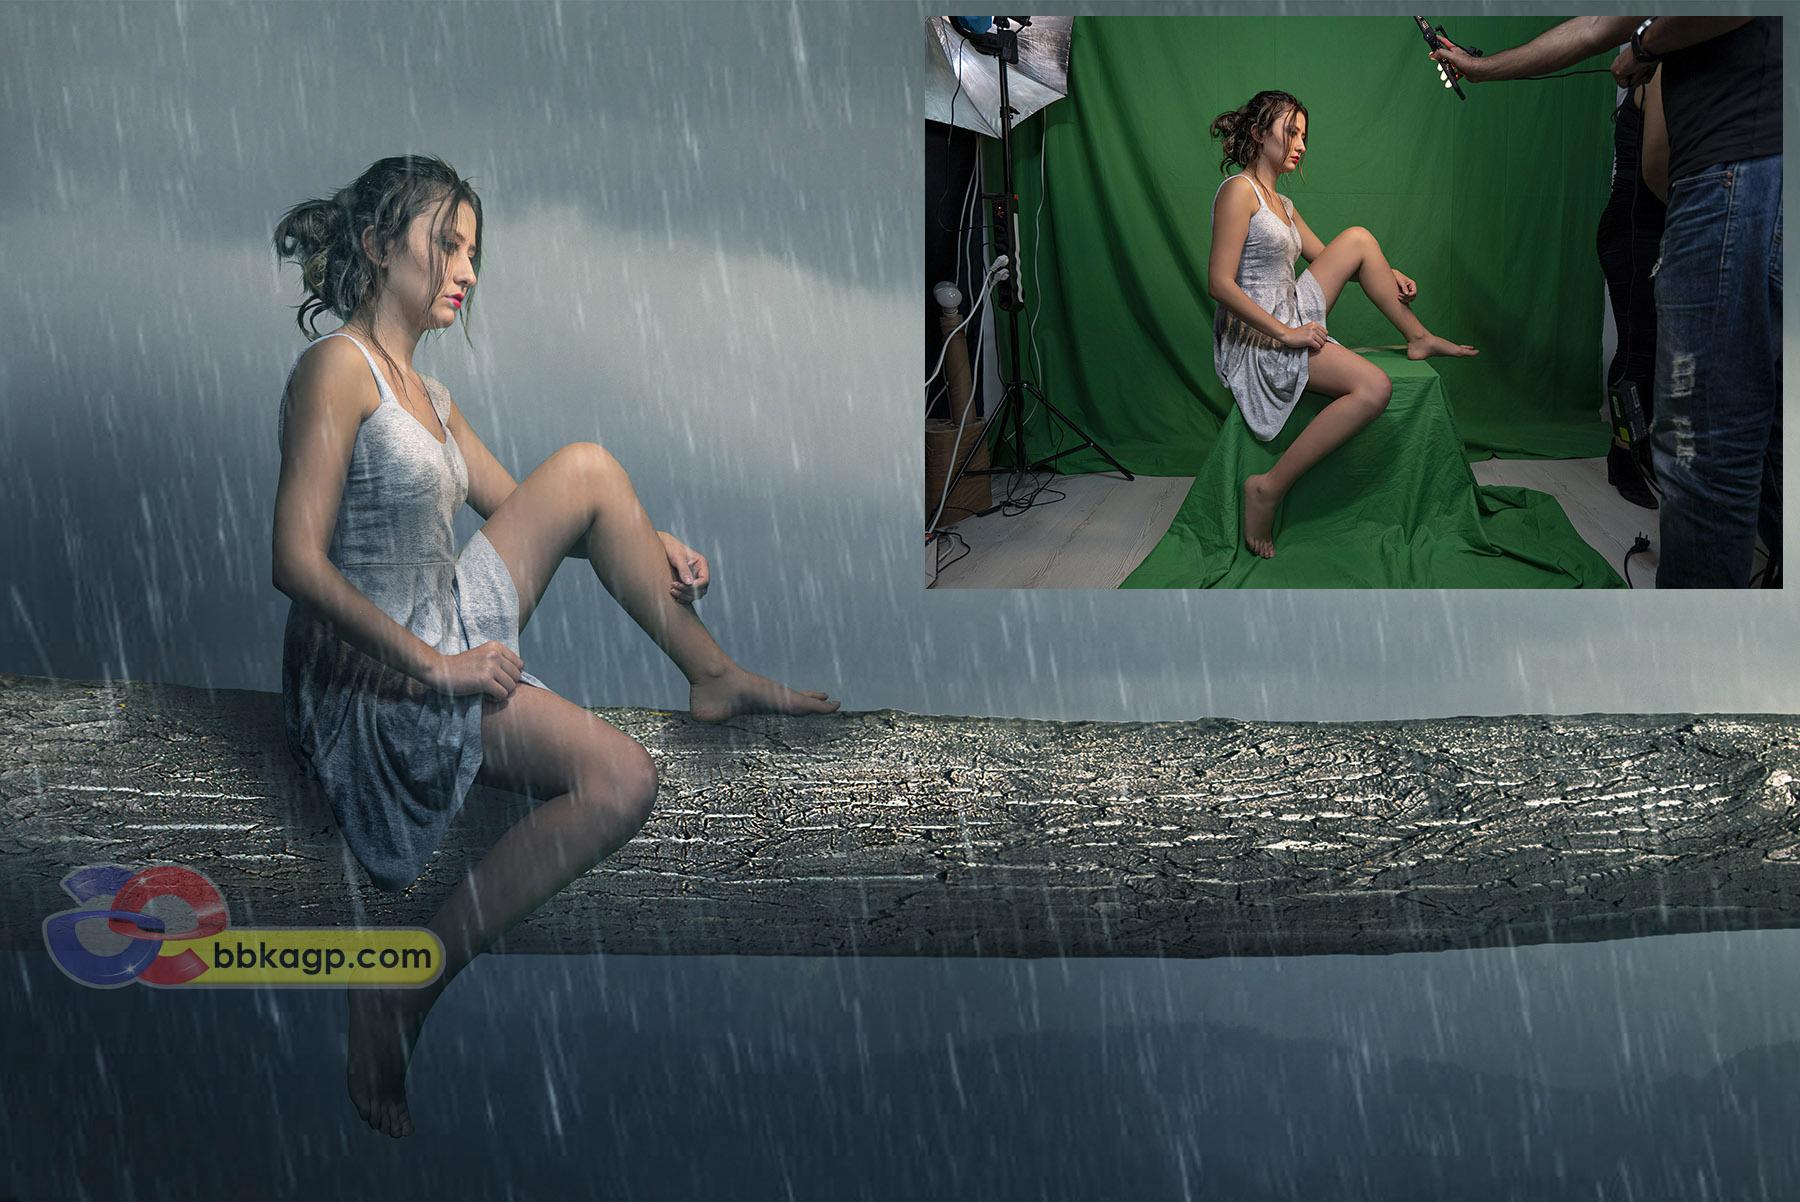 Fantastic Fotograf Cekimi ve Editi Kizilay